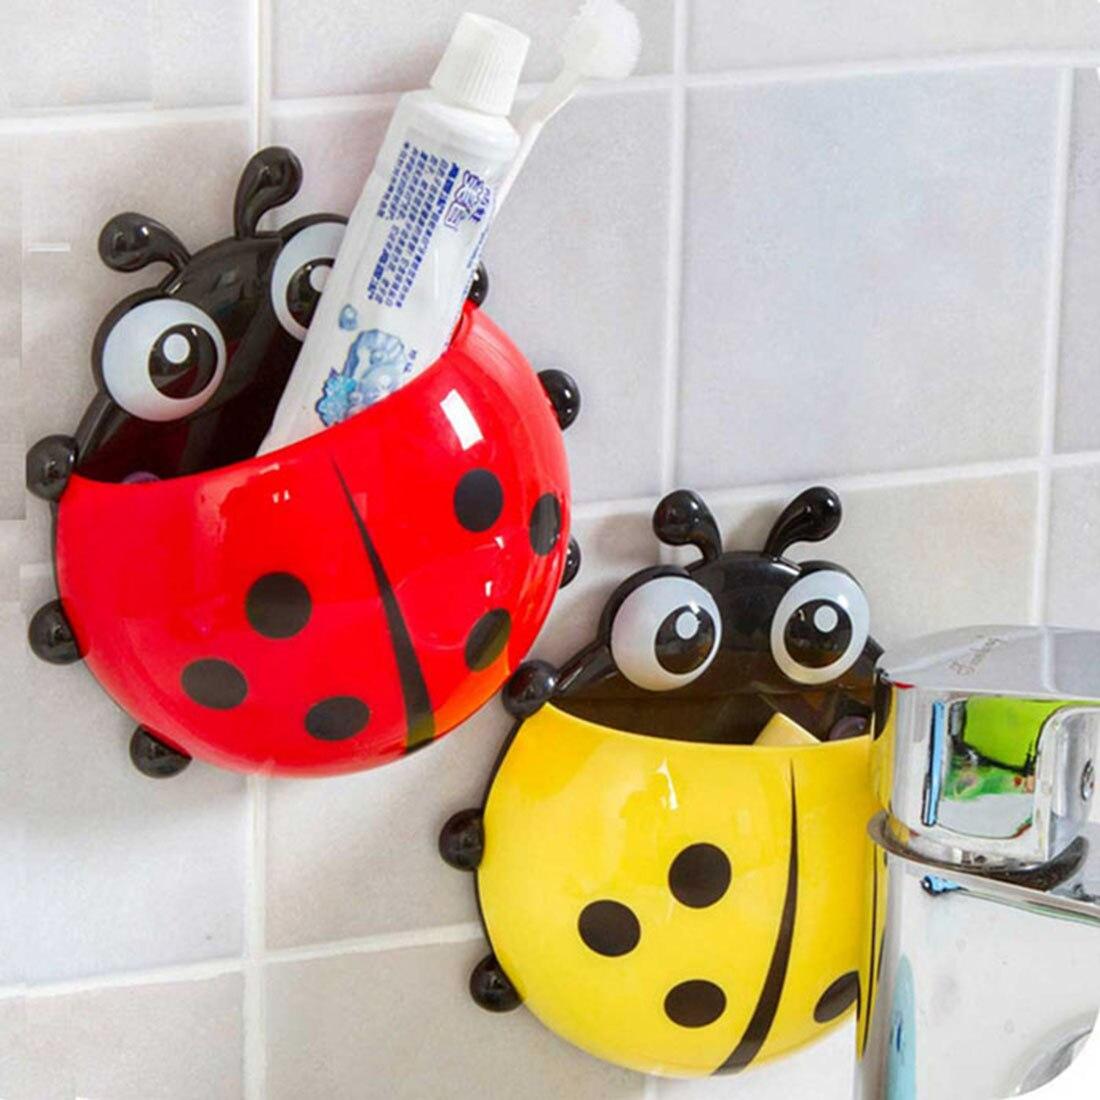 Ladybug Bathroom Accessories High Quality I Love Sh Buy Cheap I Love Sh Lots From High Quality